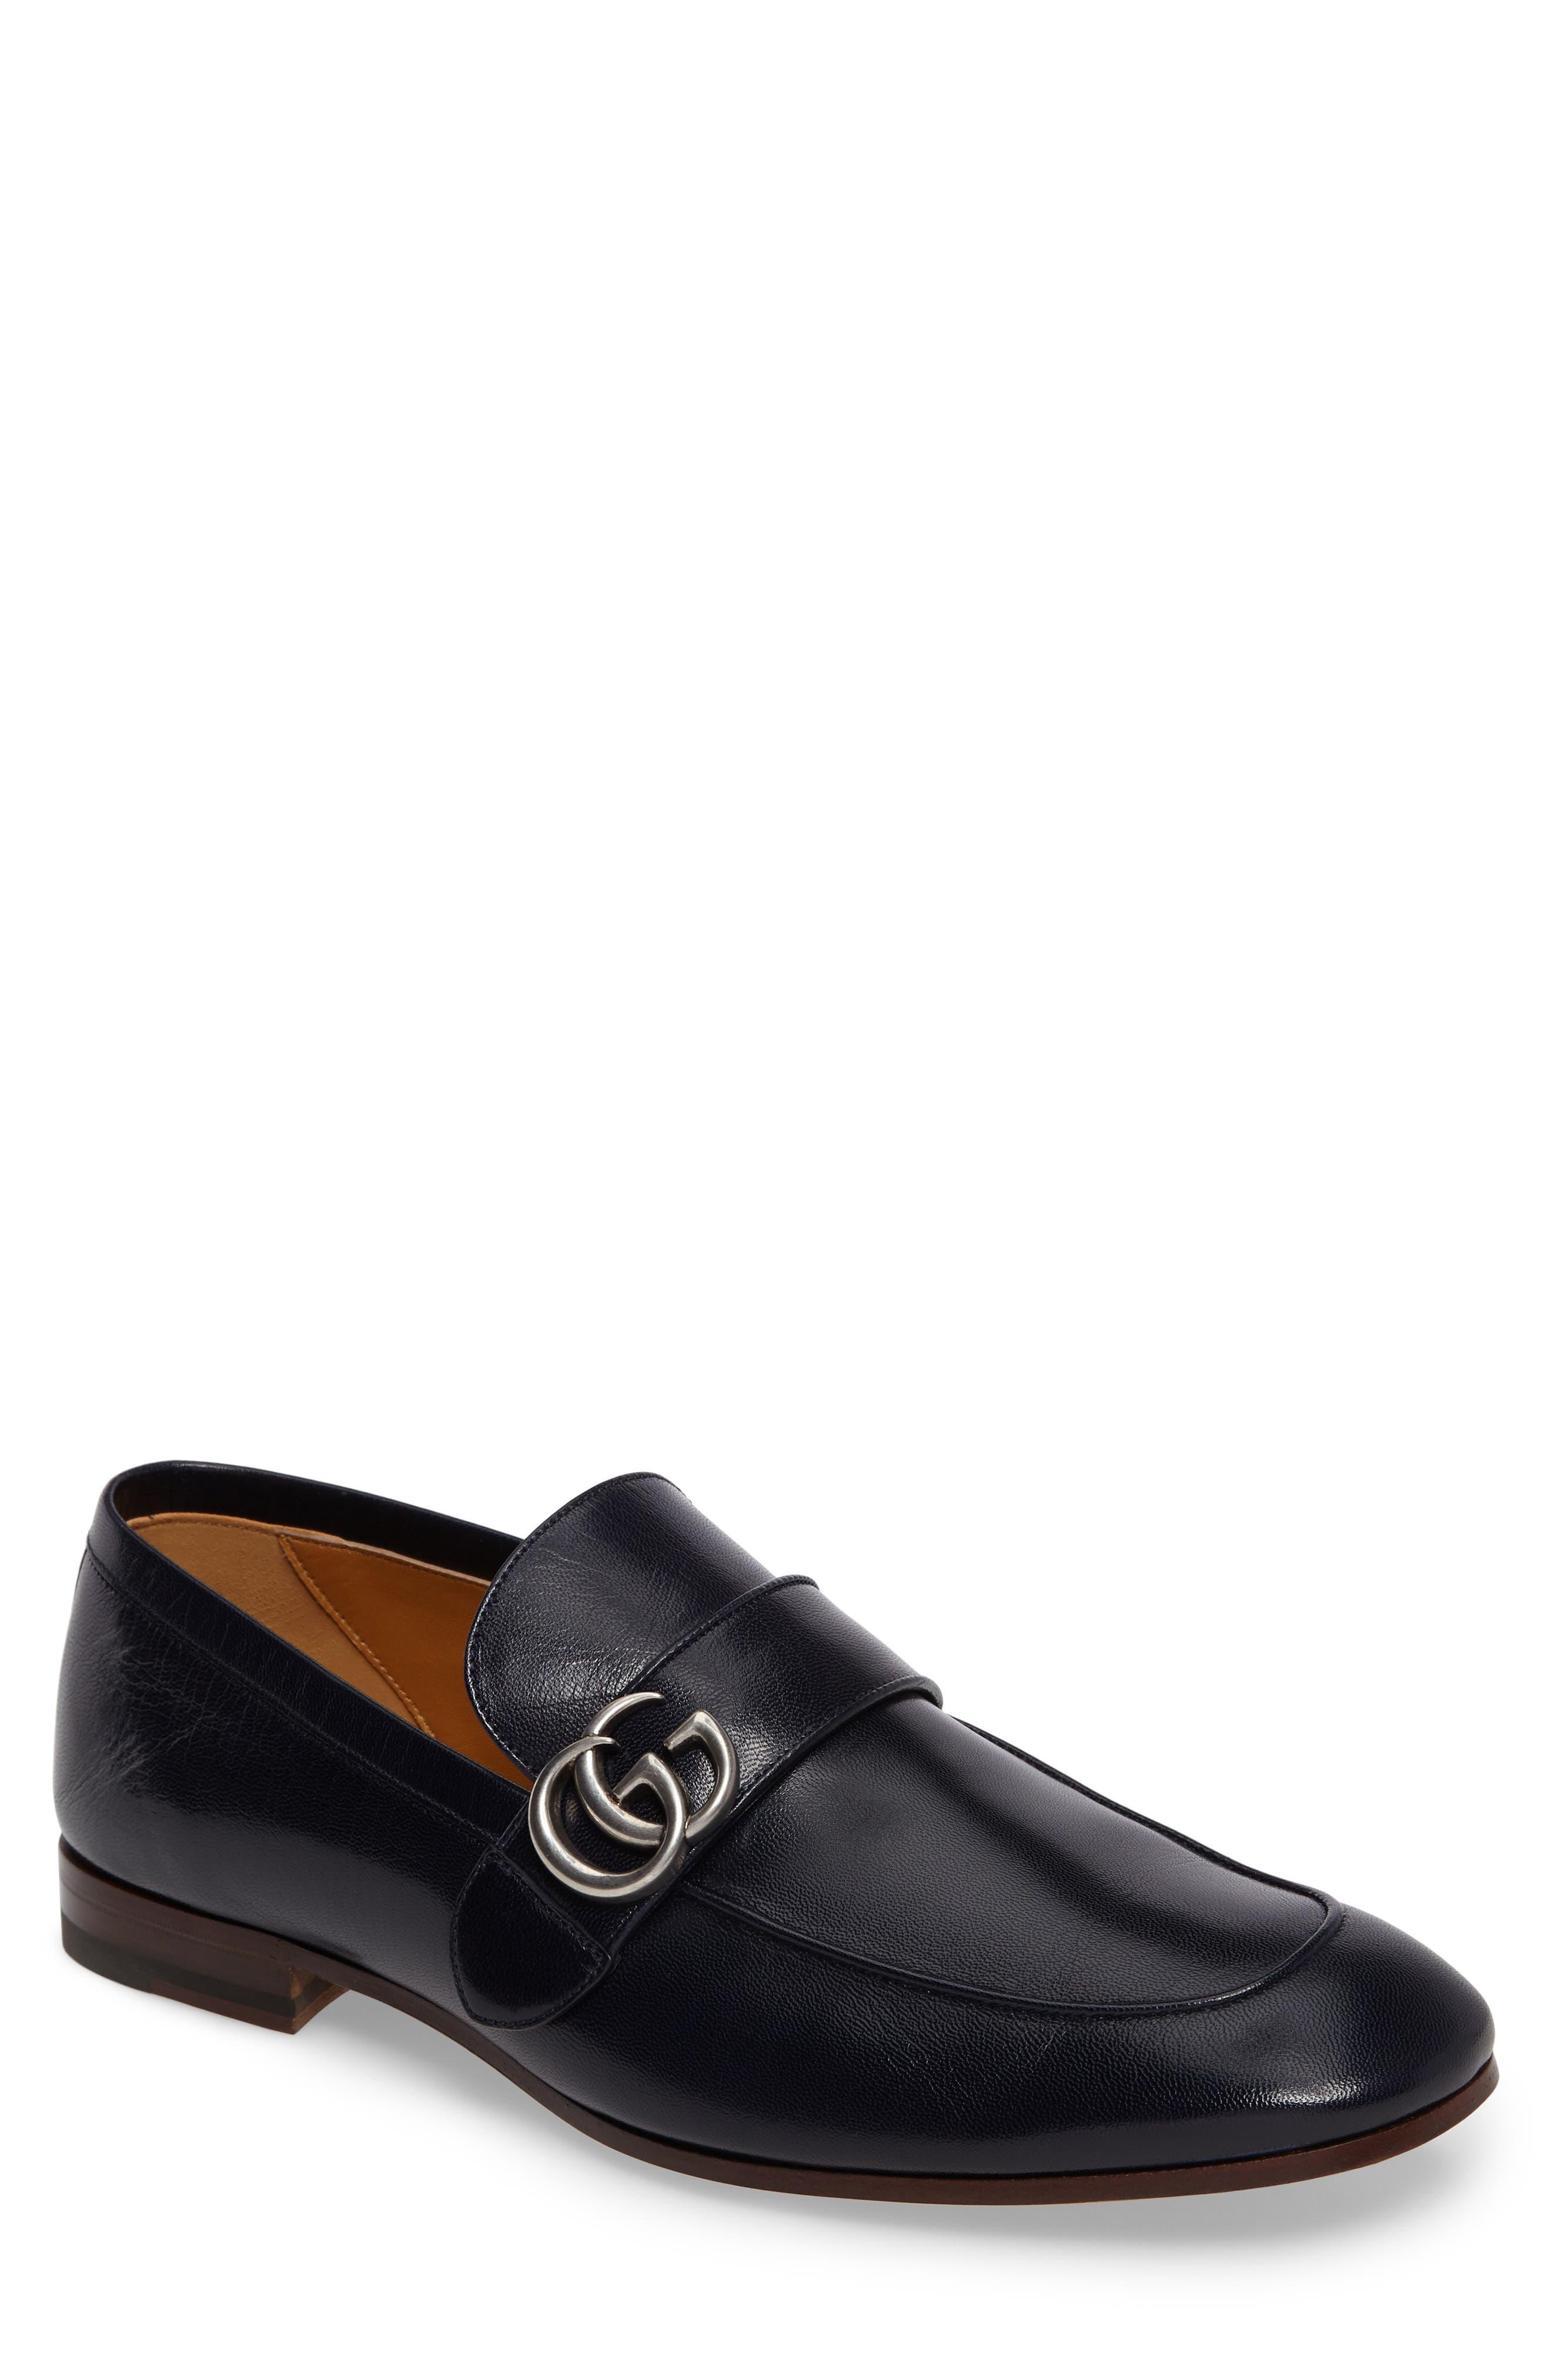 Gucci Donnie Bit Loafer (Men)